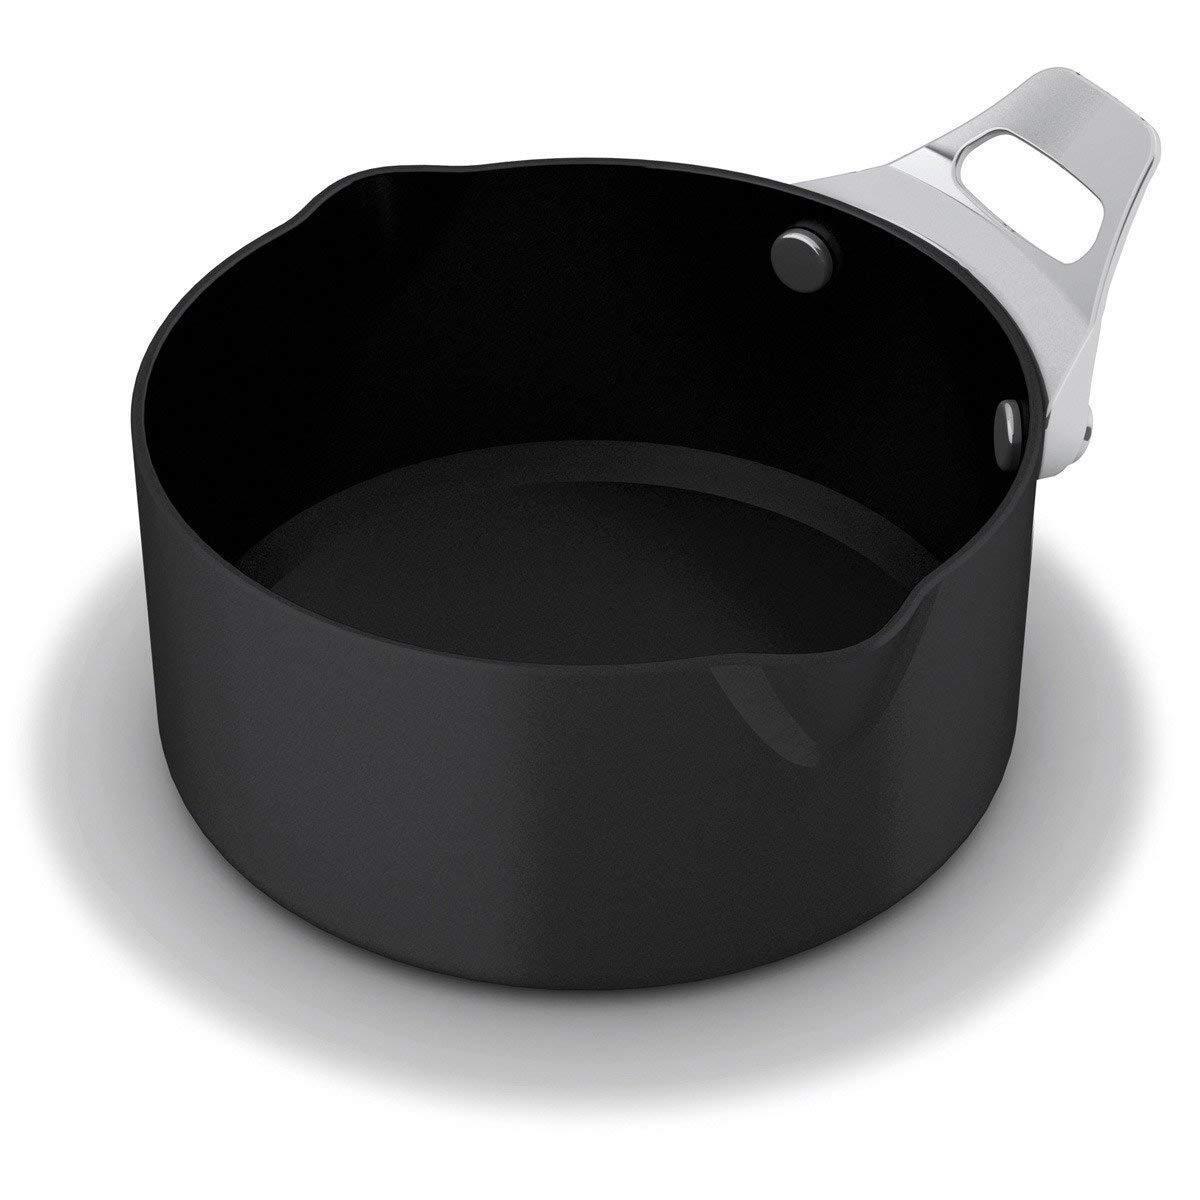 Estilo de WEBER 17502 utensilios system salsa olla 120 x 190 mm